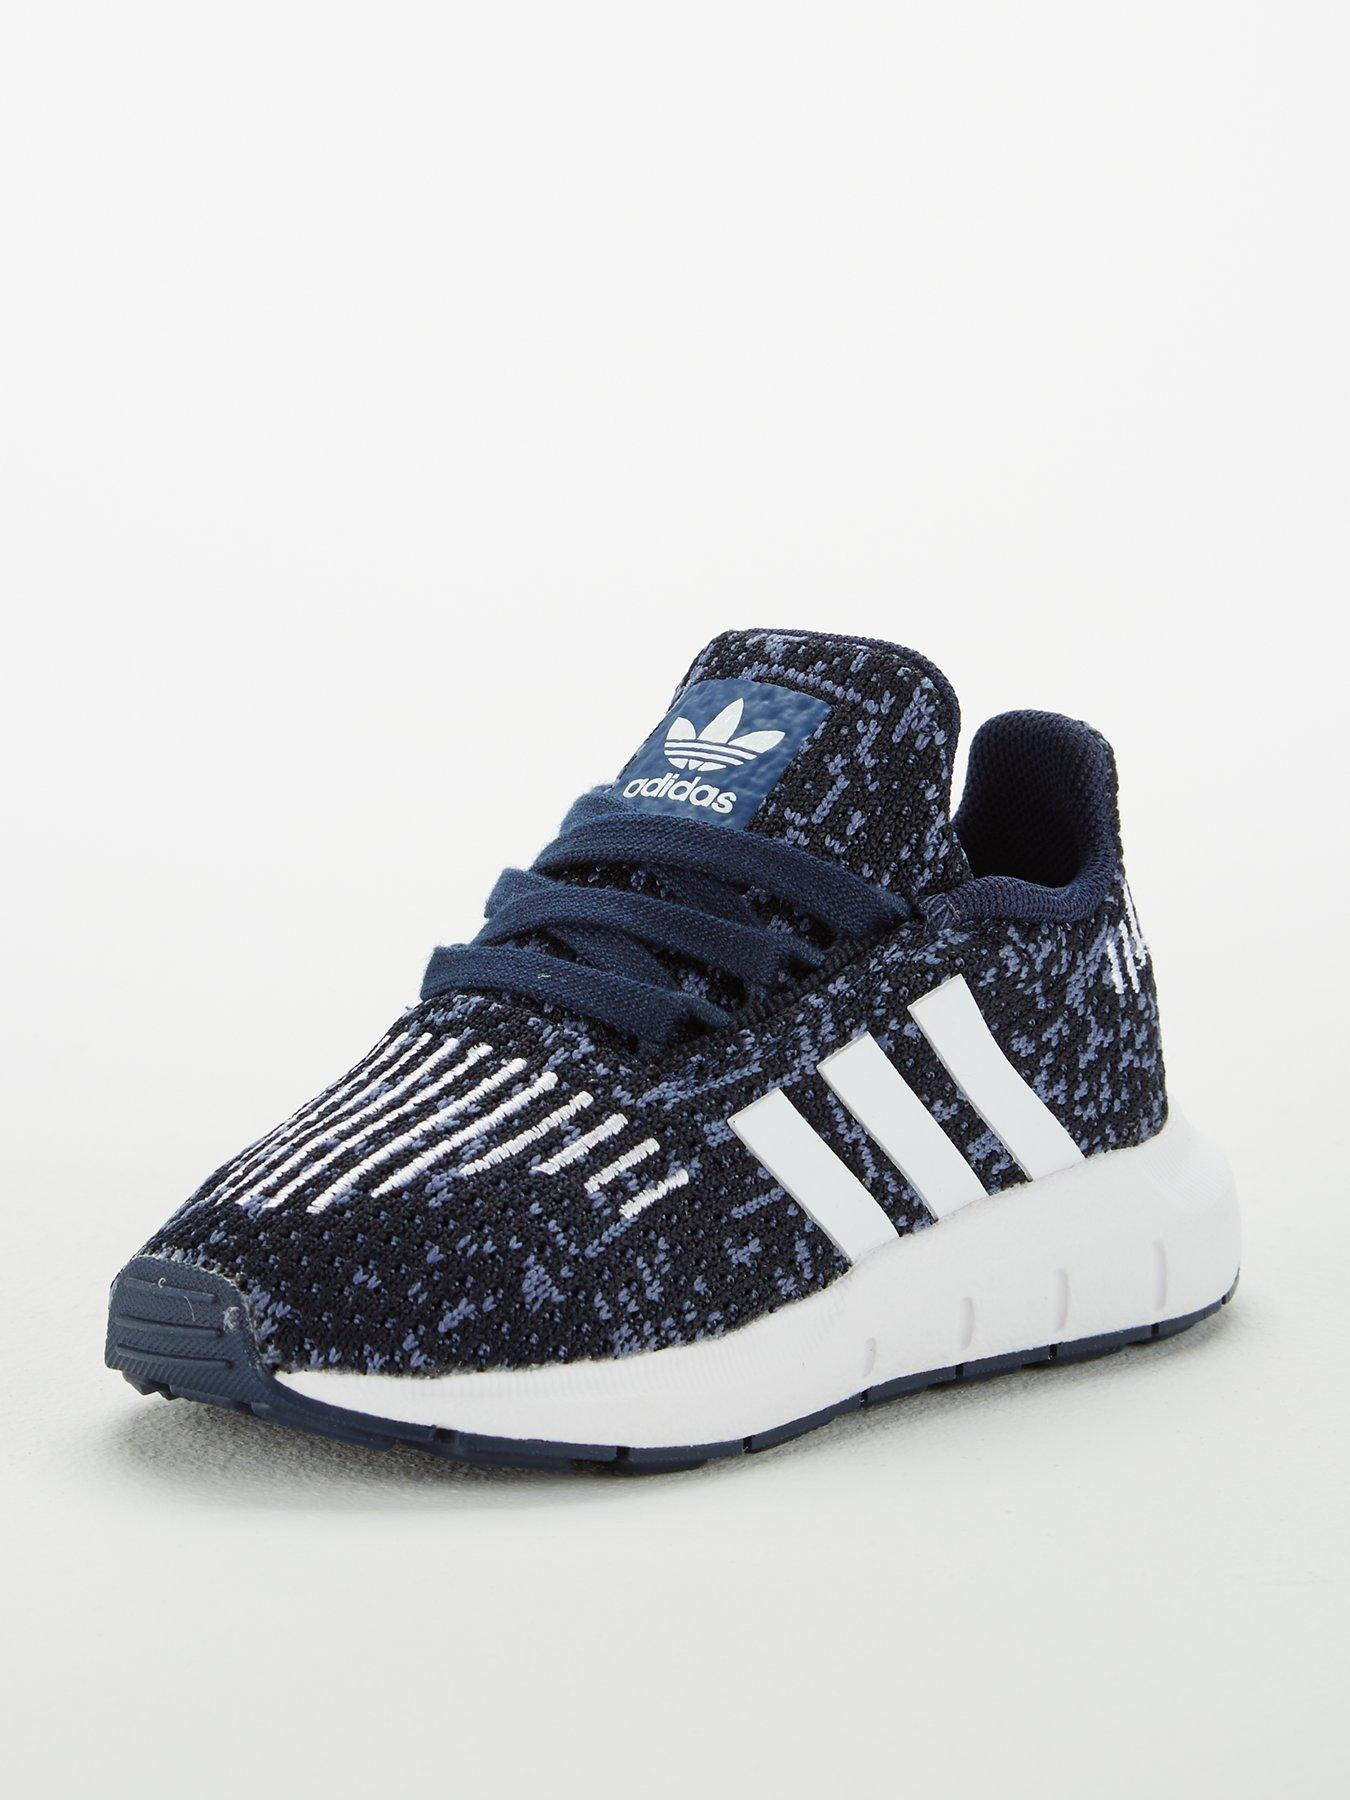 Girls Preschool Adidas Swift Run